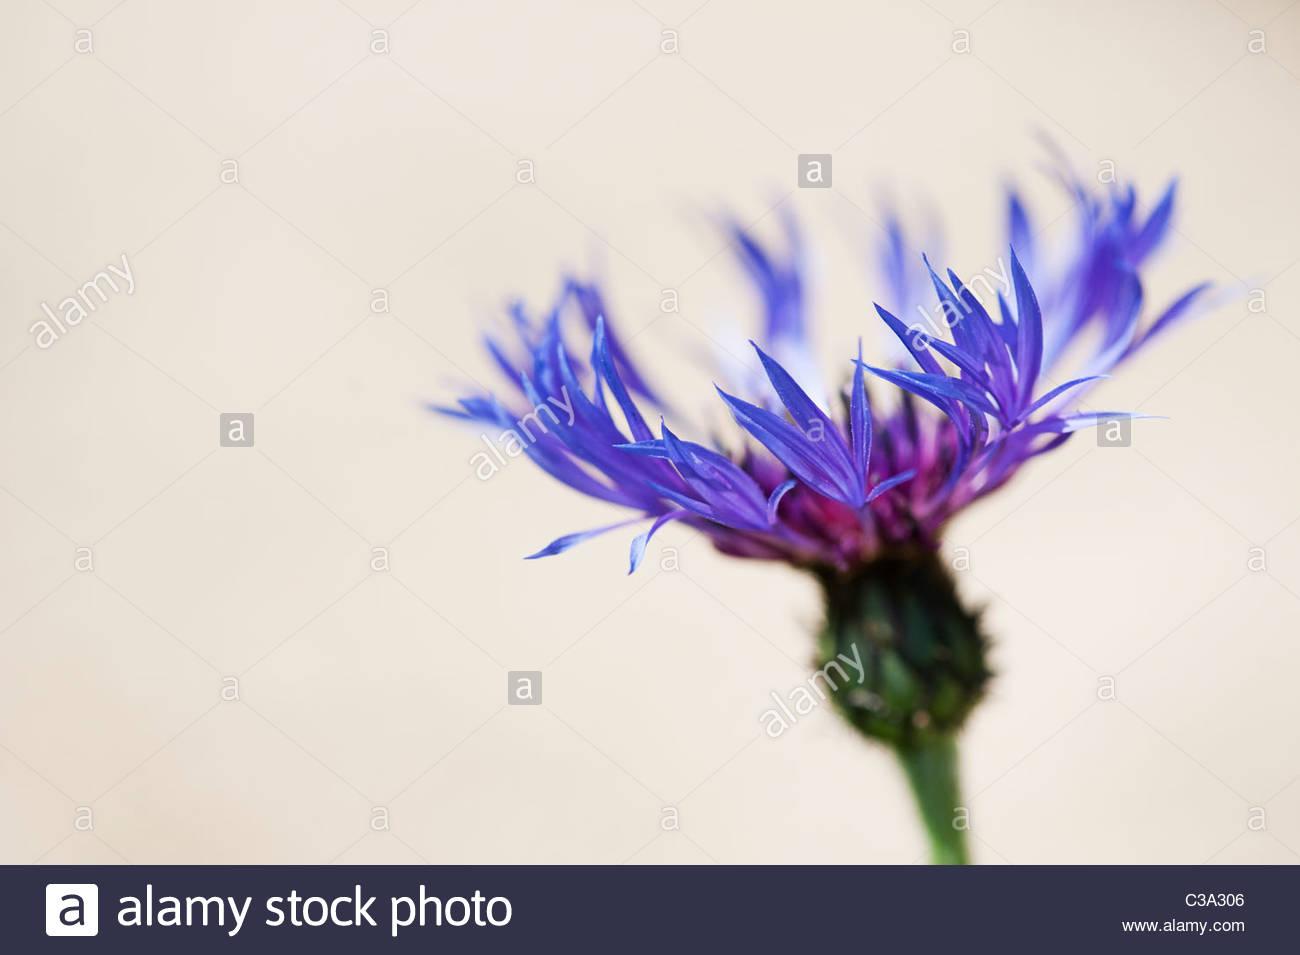 Centaurea montana. Perennial cornflower, Mountain bluet, Knapweed, Mountain knapweed against a light background. - Stock Image